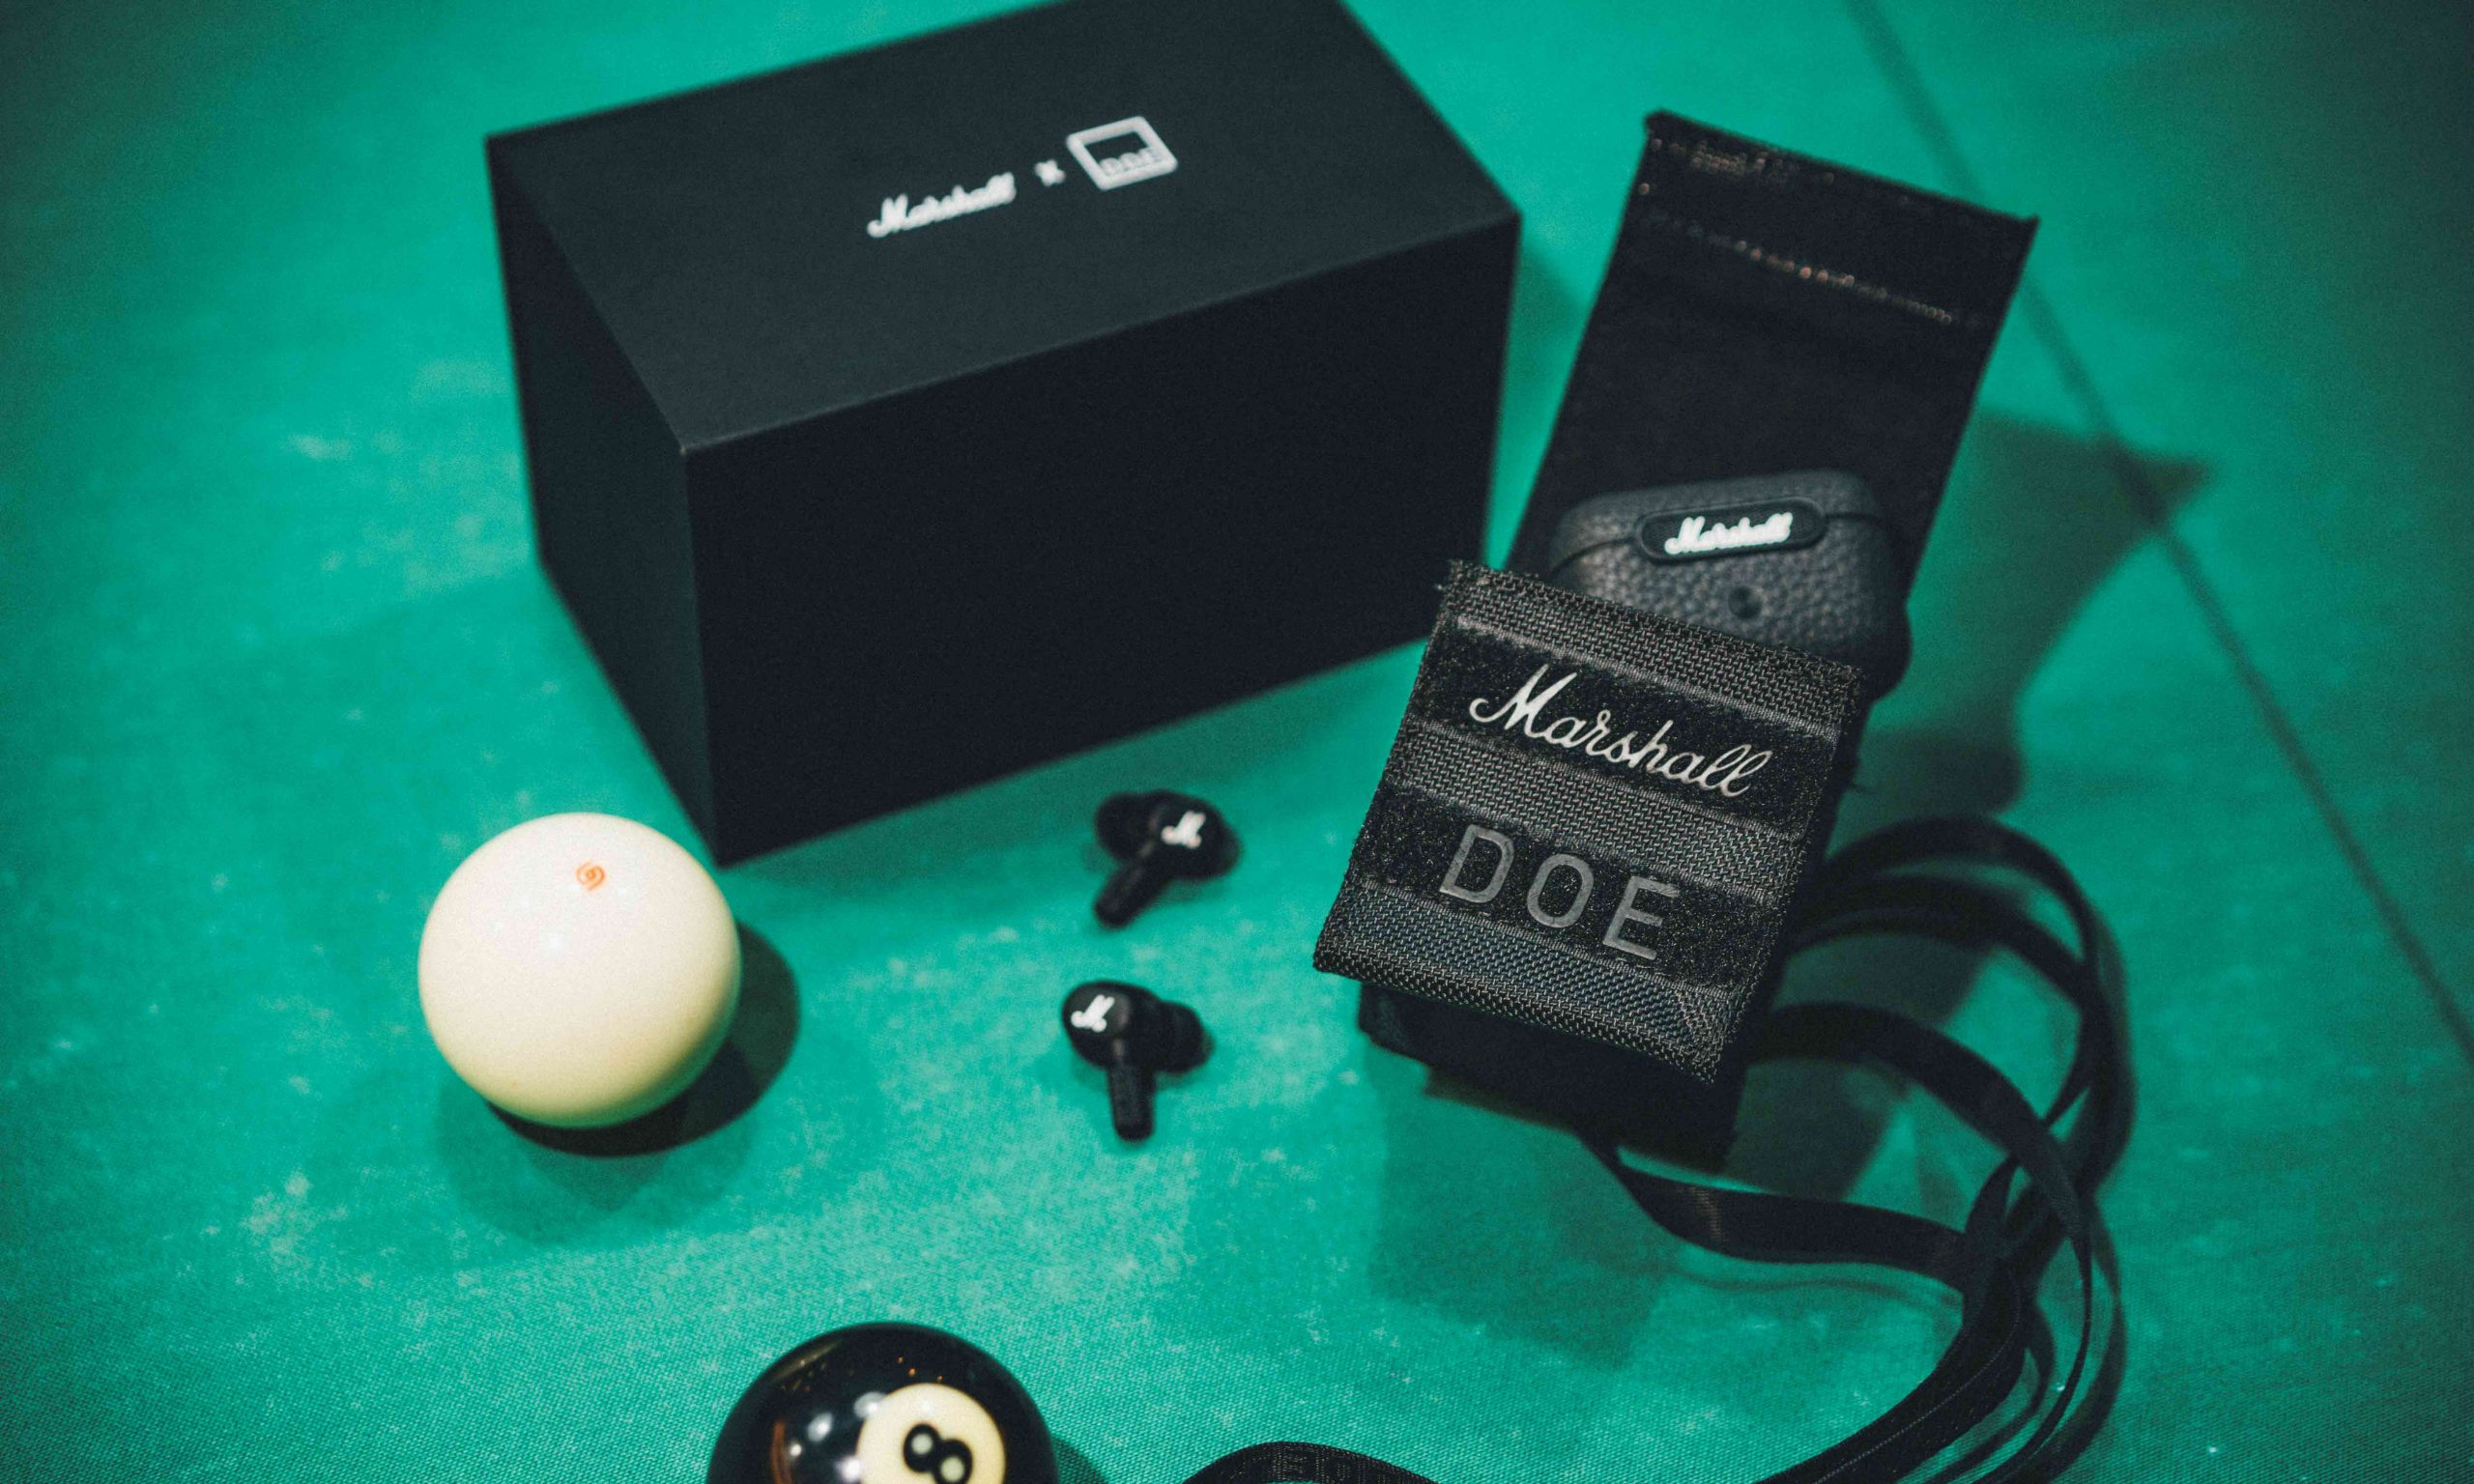 Marshall 新品真无线耳机 Motif A.N.C. 现身 DOE 联名惊喜派对